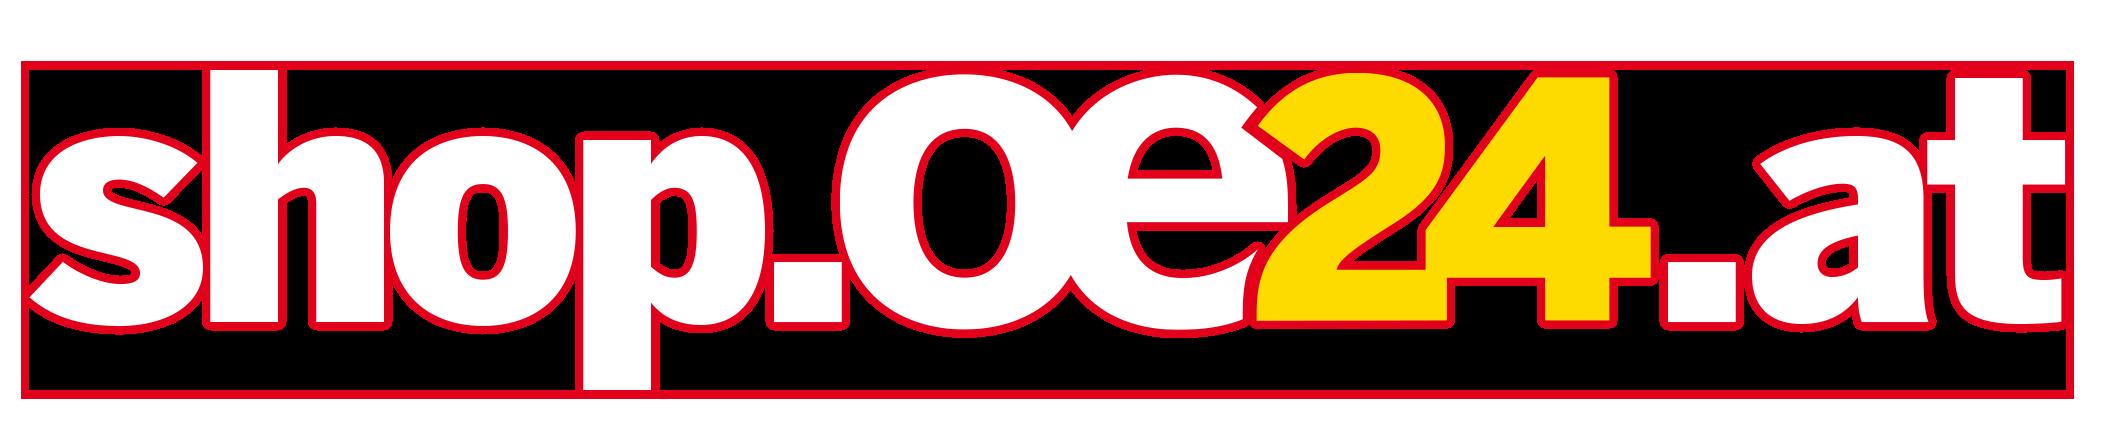 Shop OE24.AT